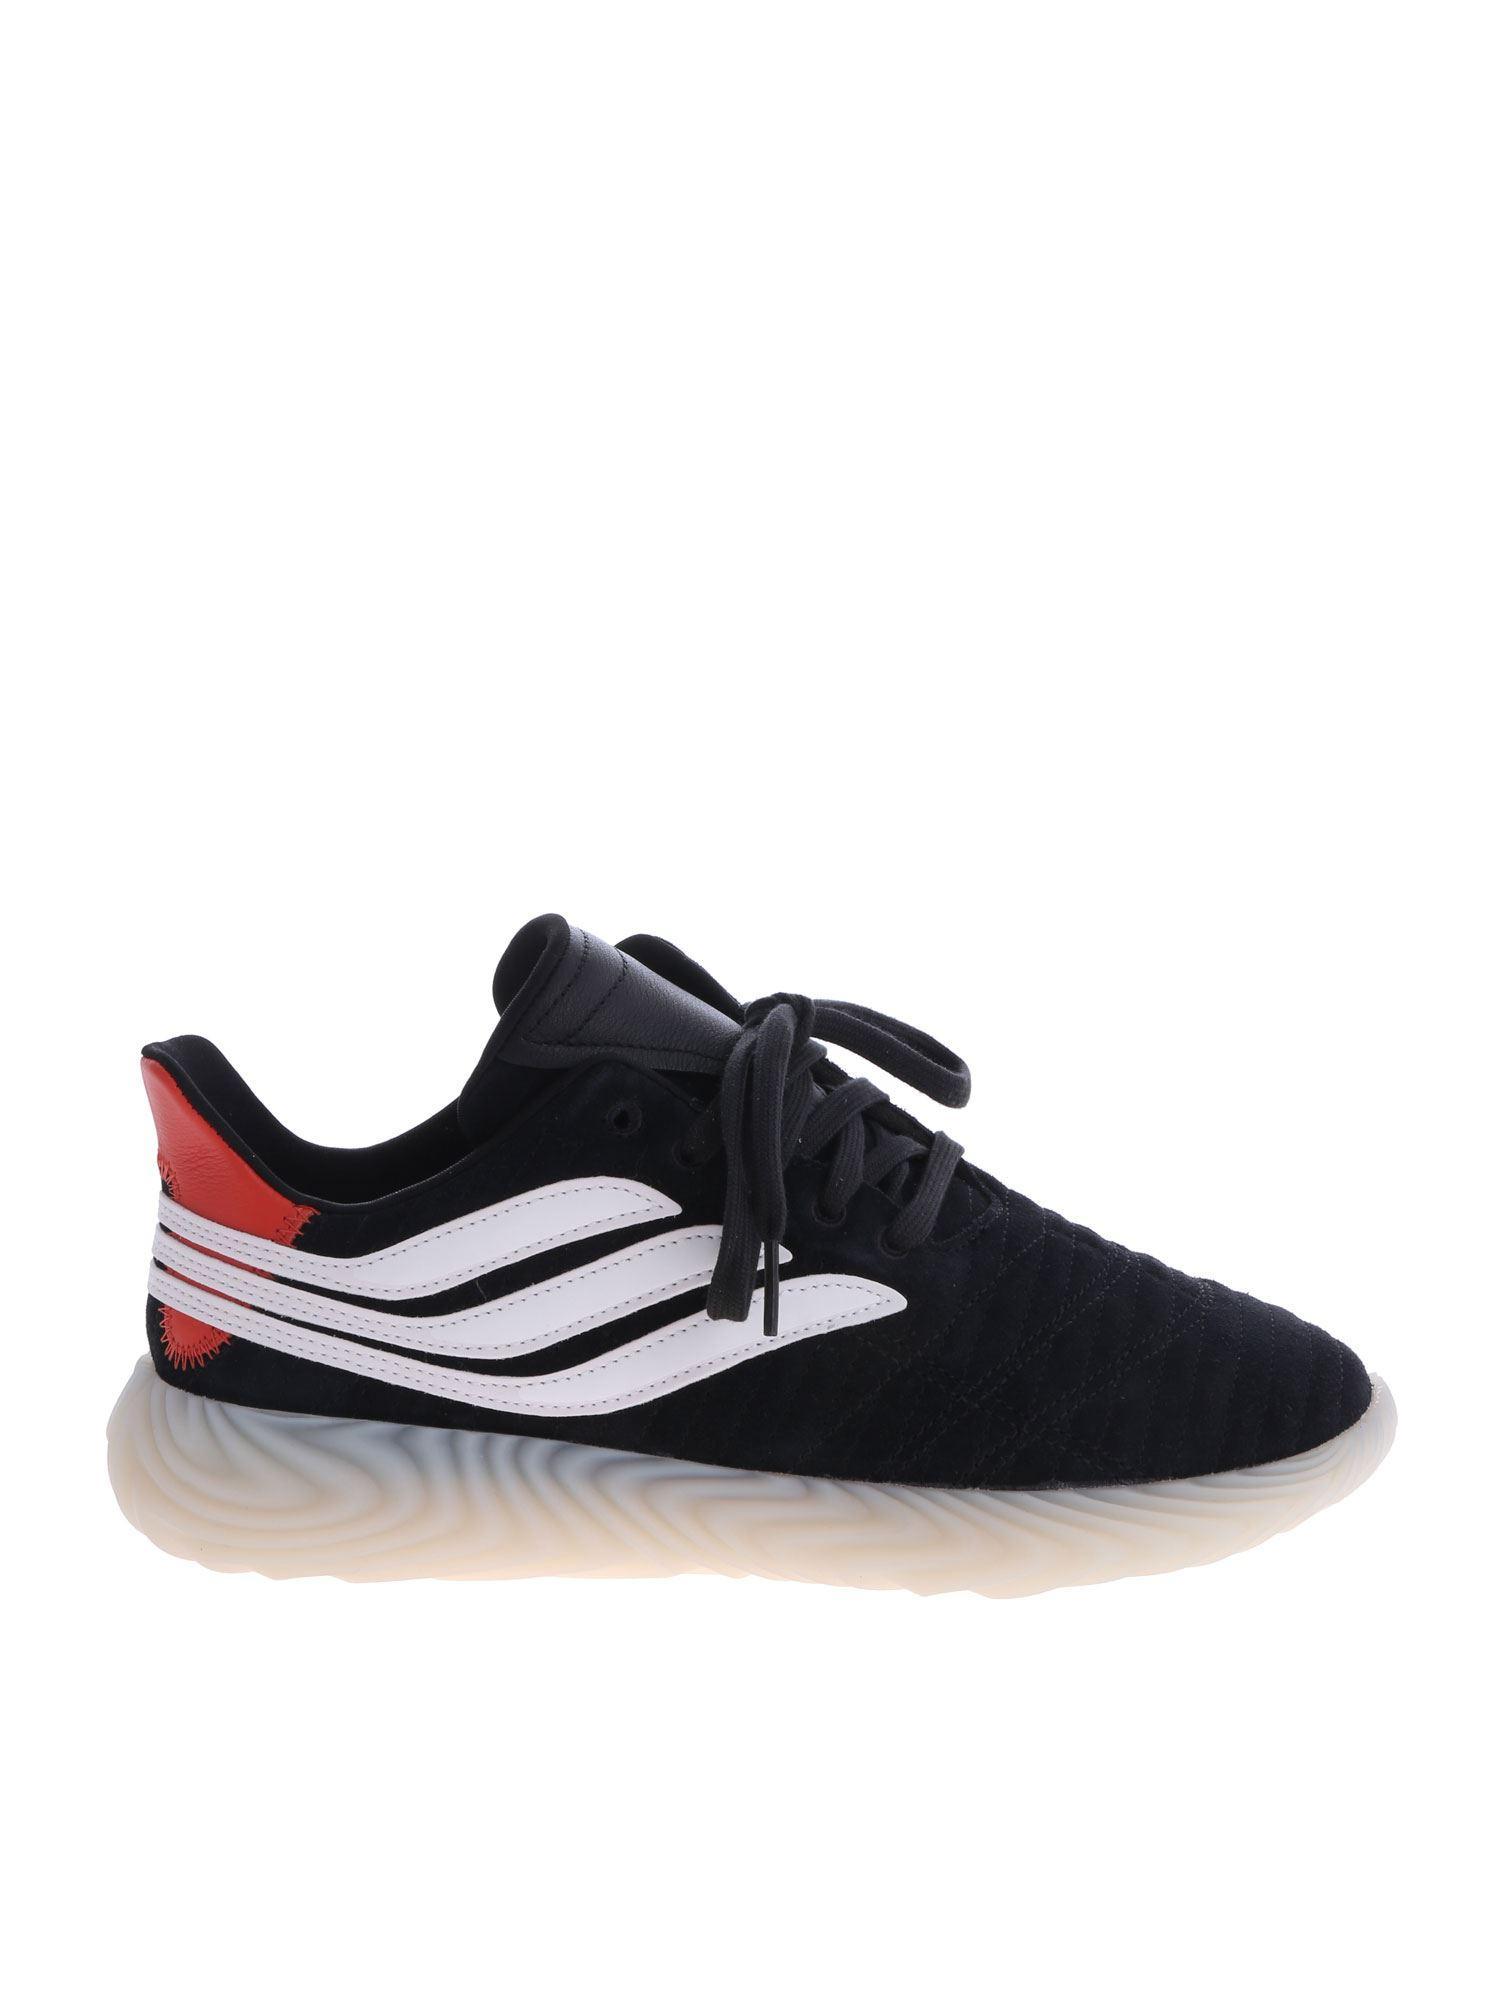 best service a0187 49cb3 adidas Originals. Men s Black Sobakov Sneakers